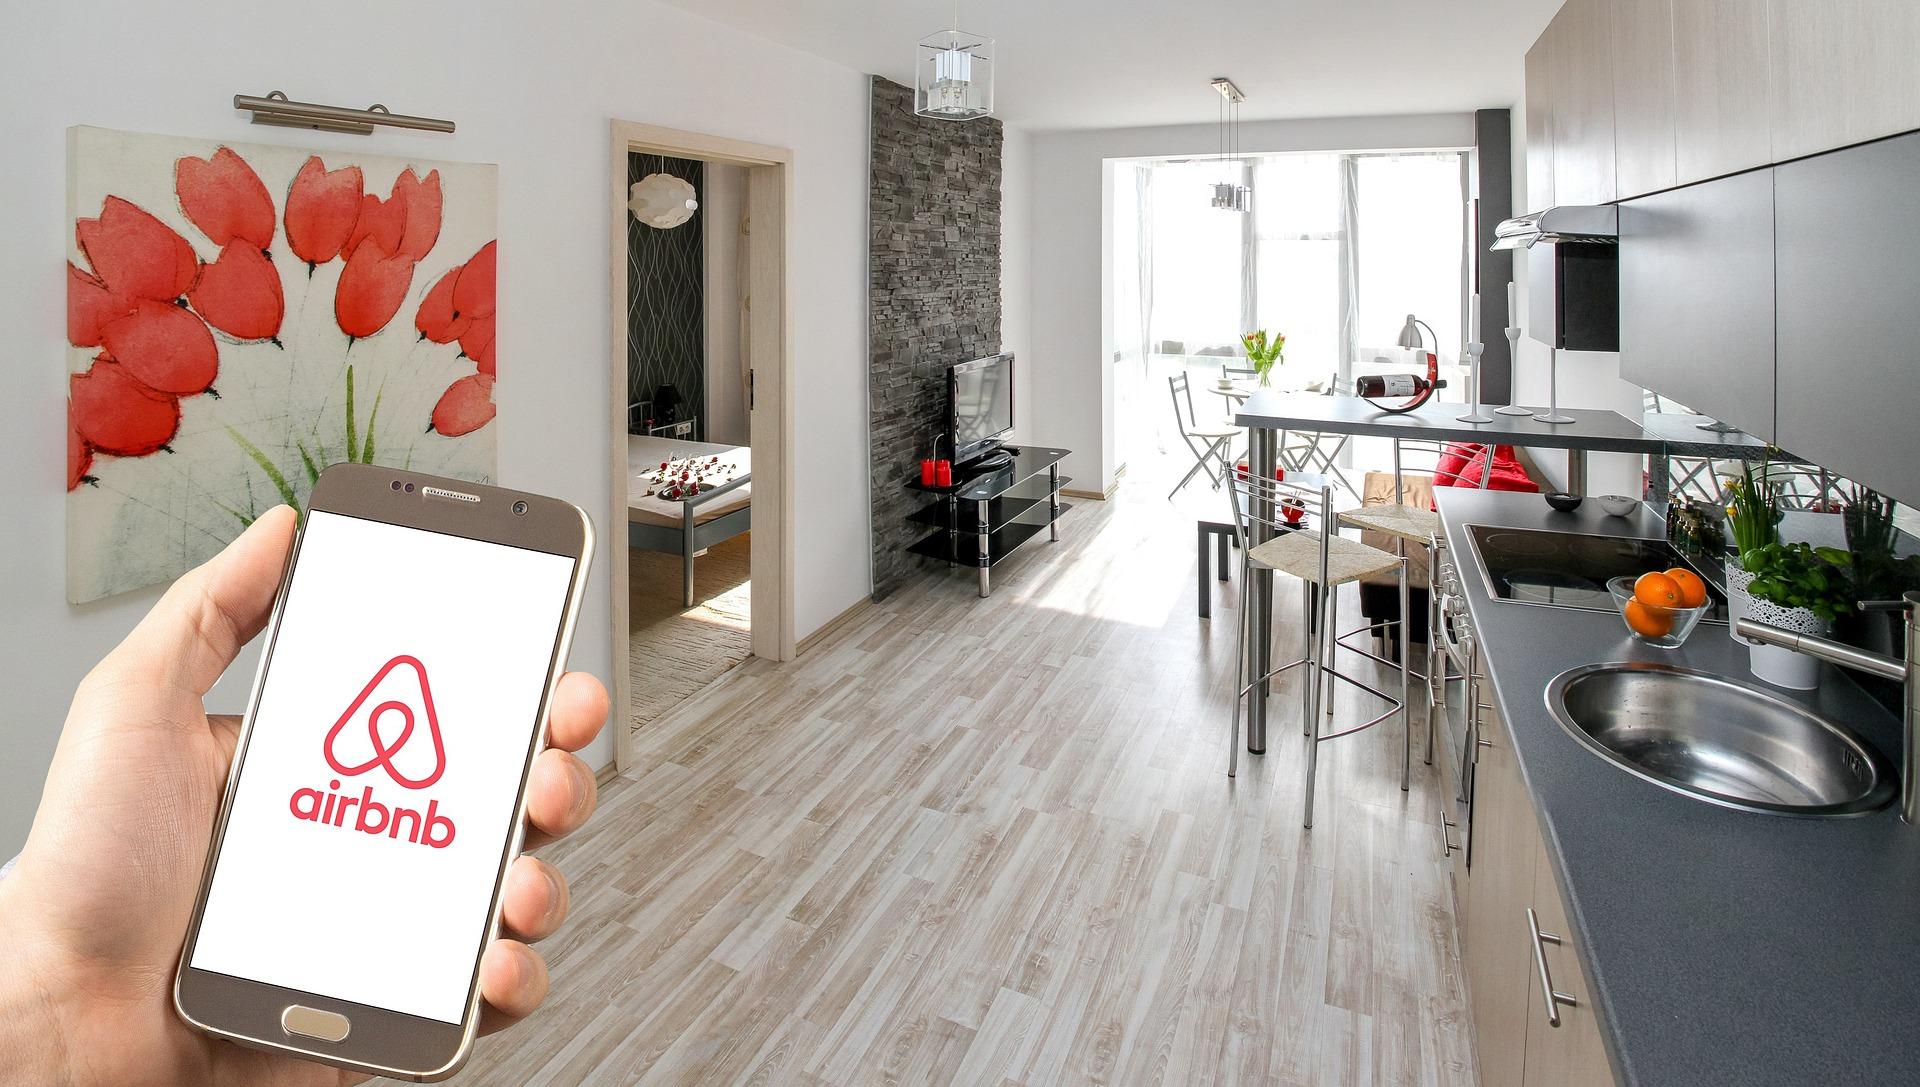 Airbnb app on phone. Photo by Reisefreiheit_eu on Pixabay